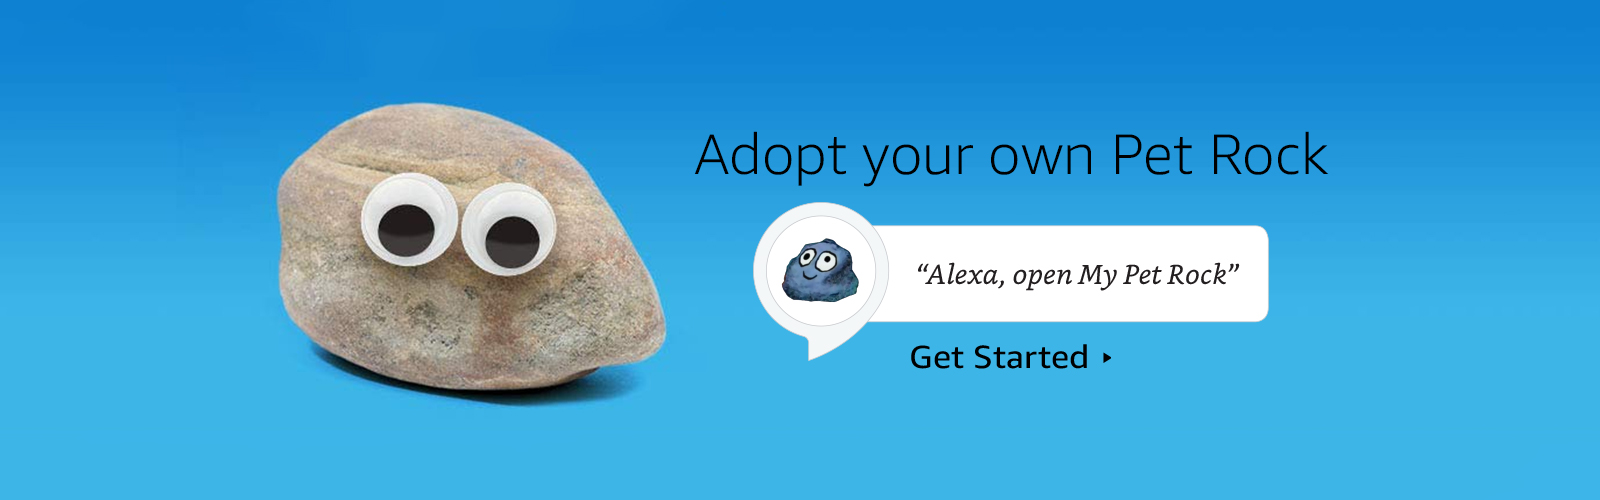 """Alexa, open My Pet Rock."""